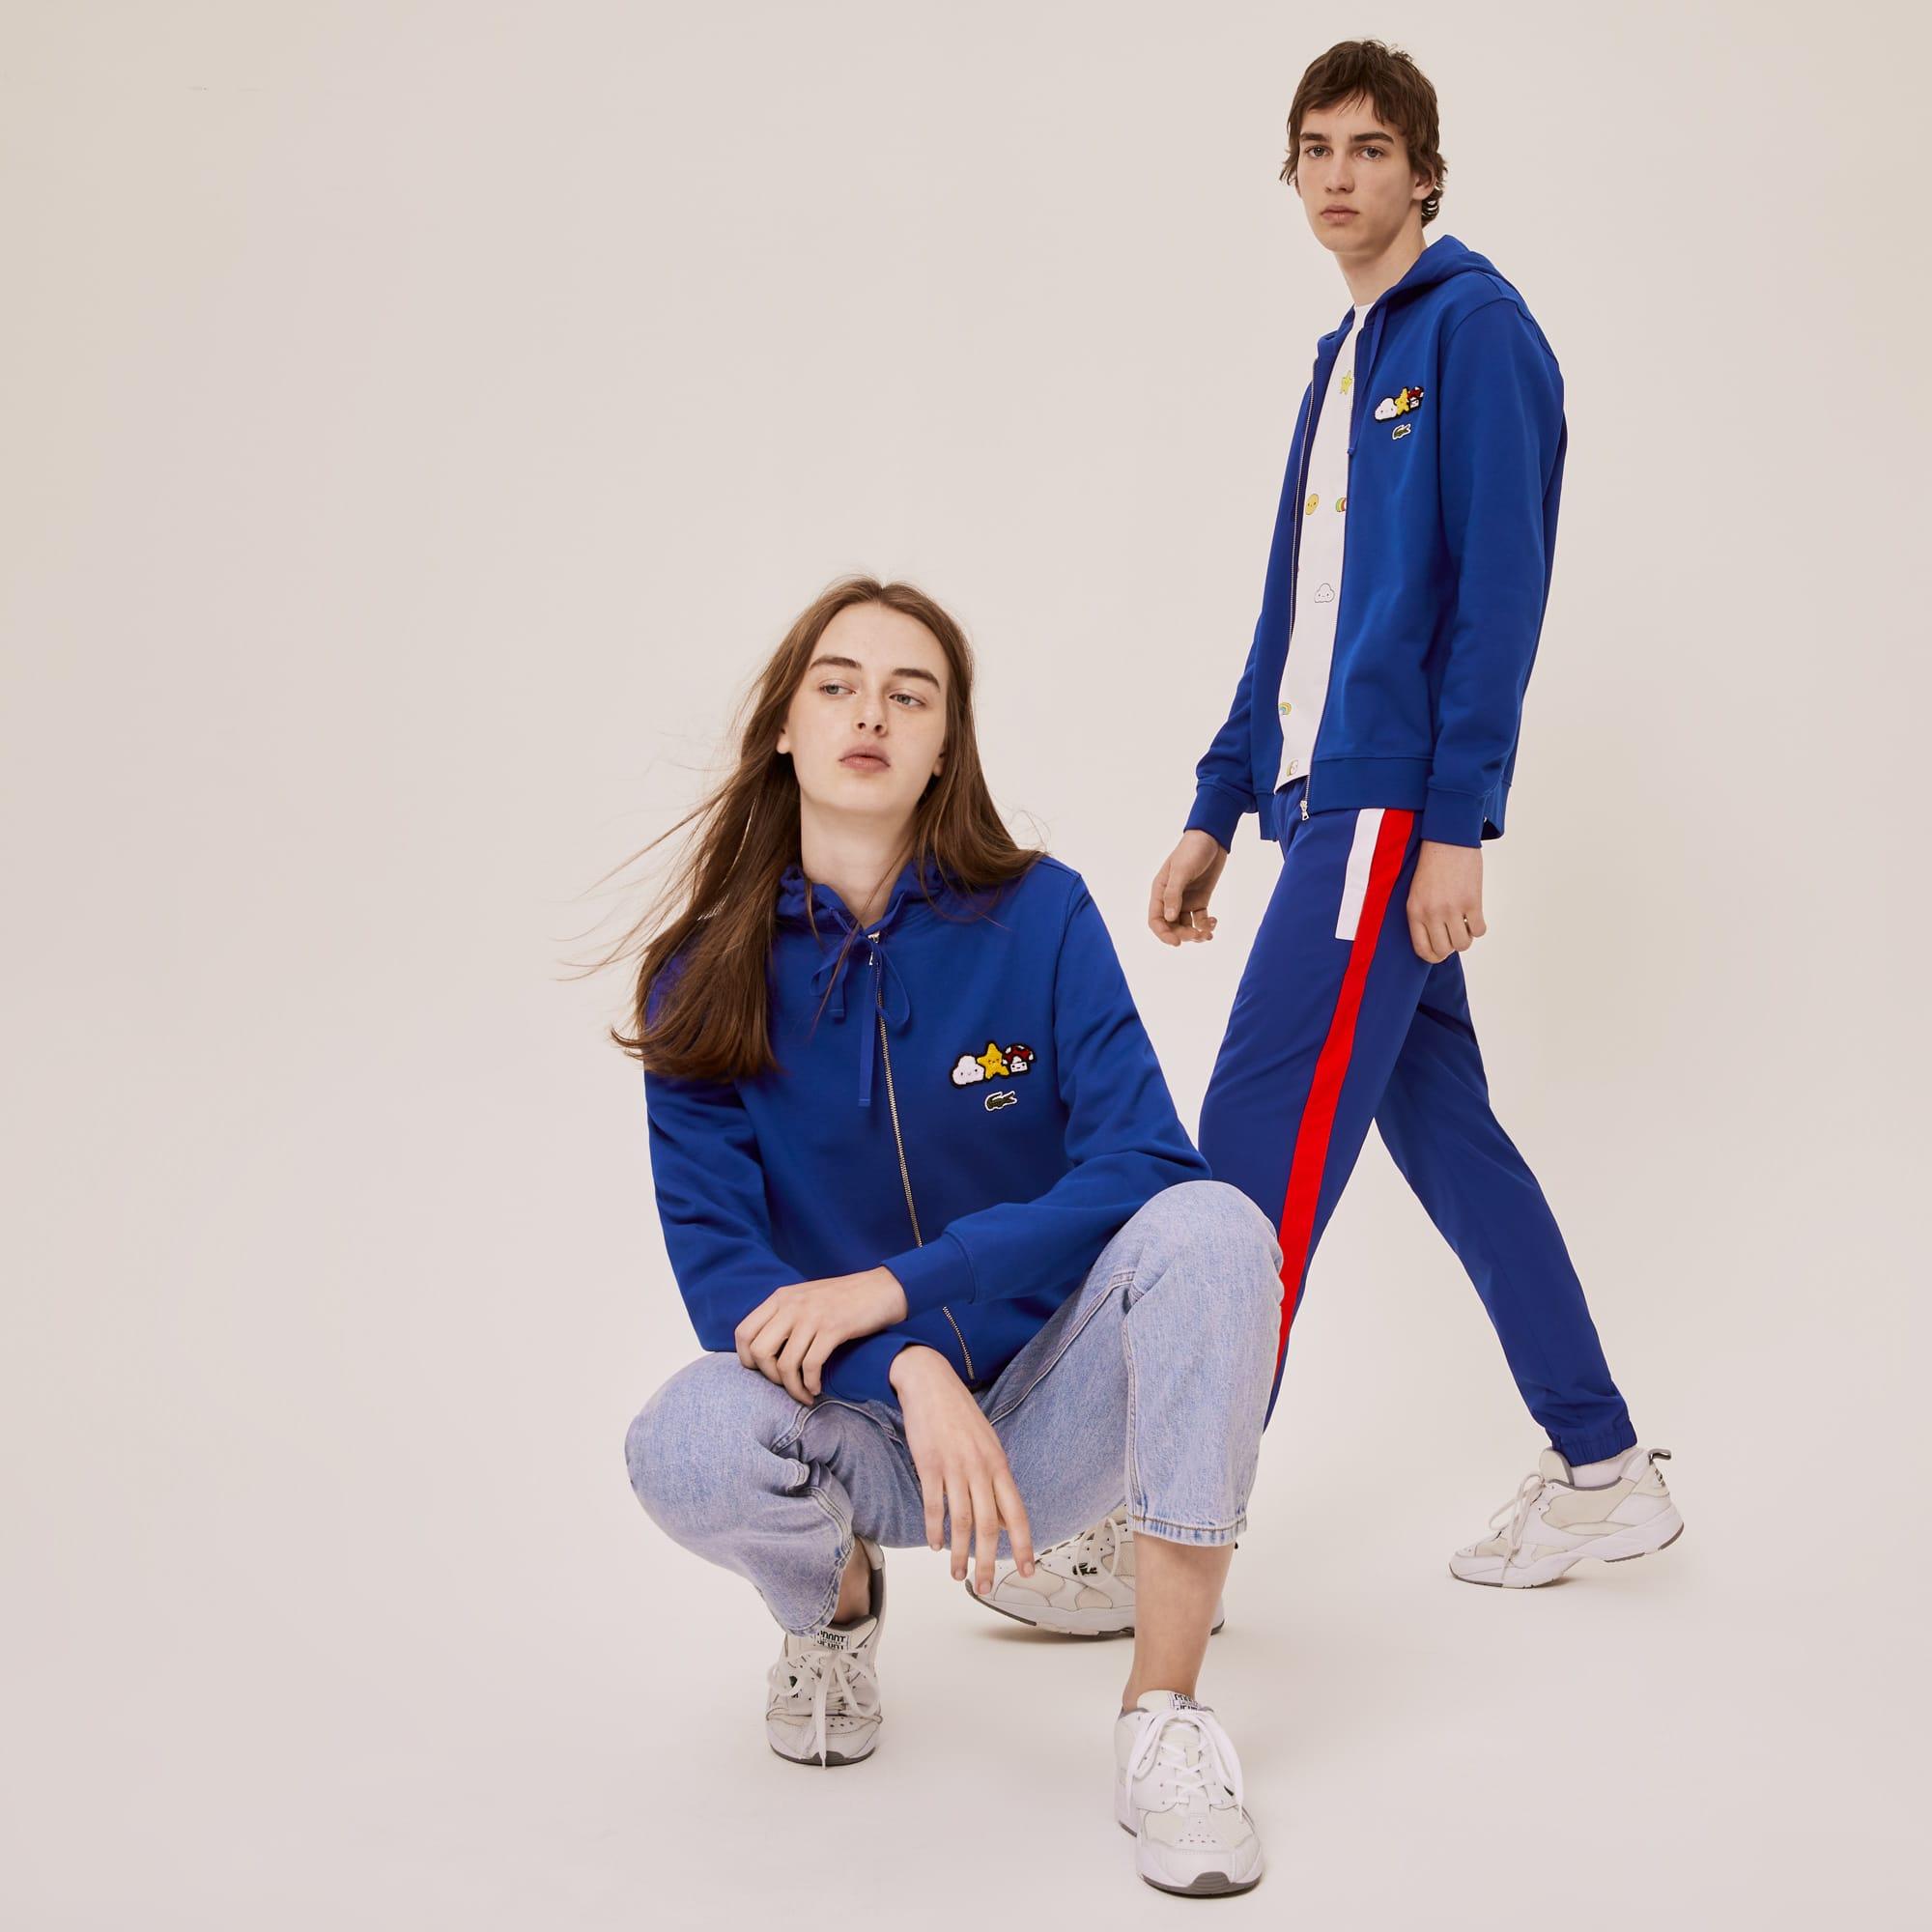 Unisex 라코스테 Lacoste x FriendsWithYou Design Zippered Jacket,Blue BDM